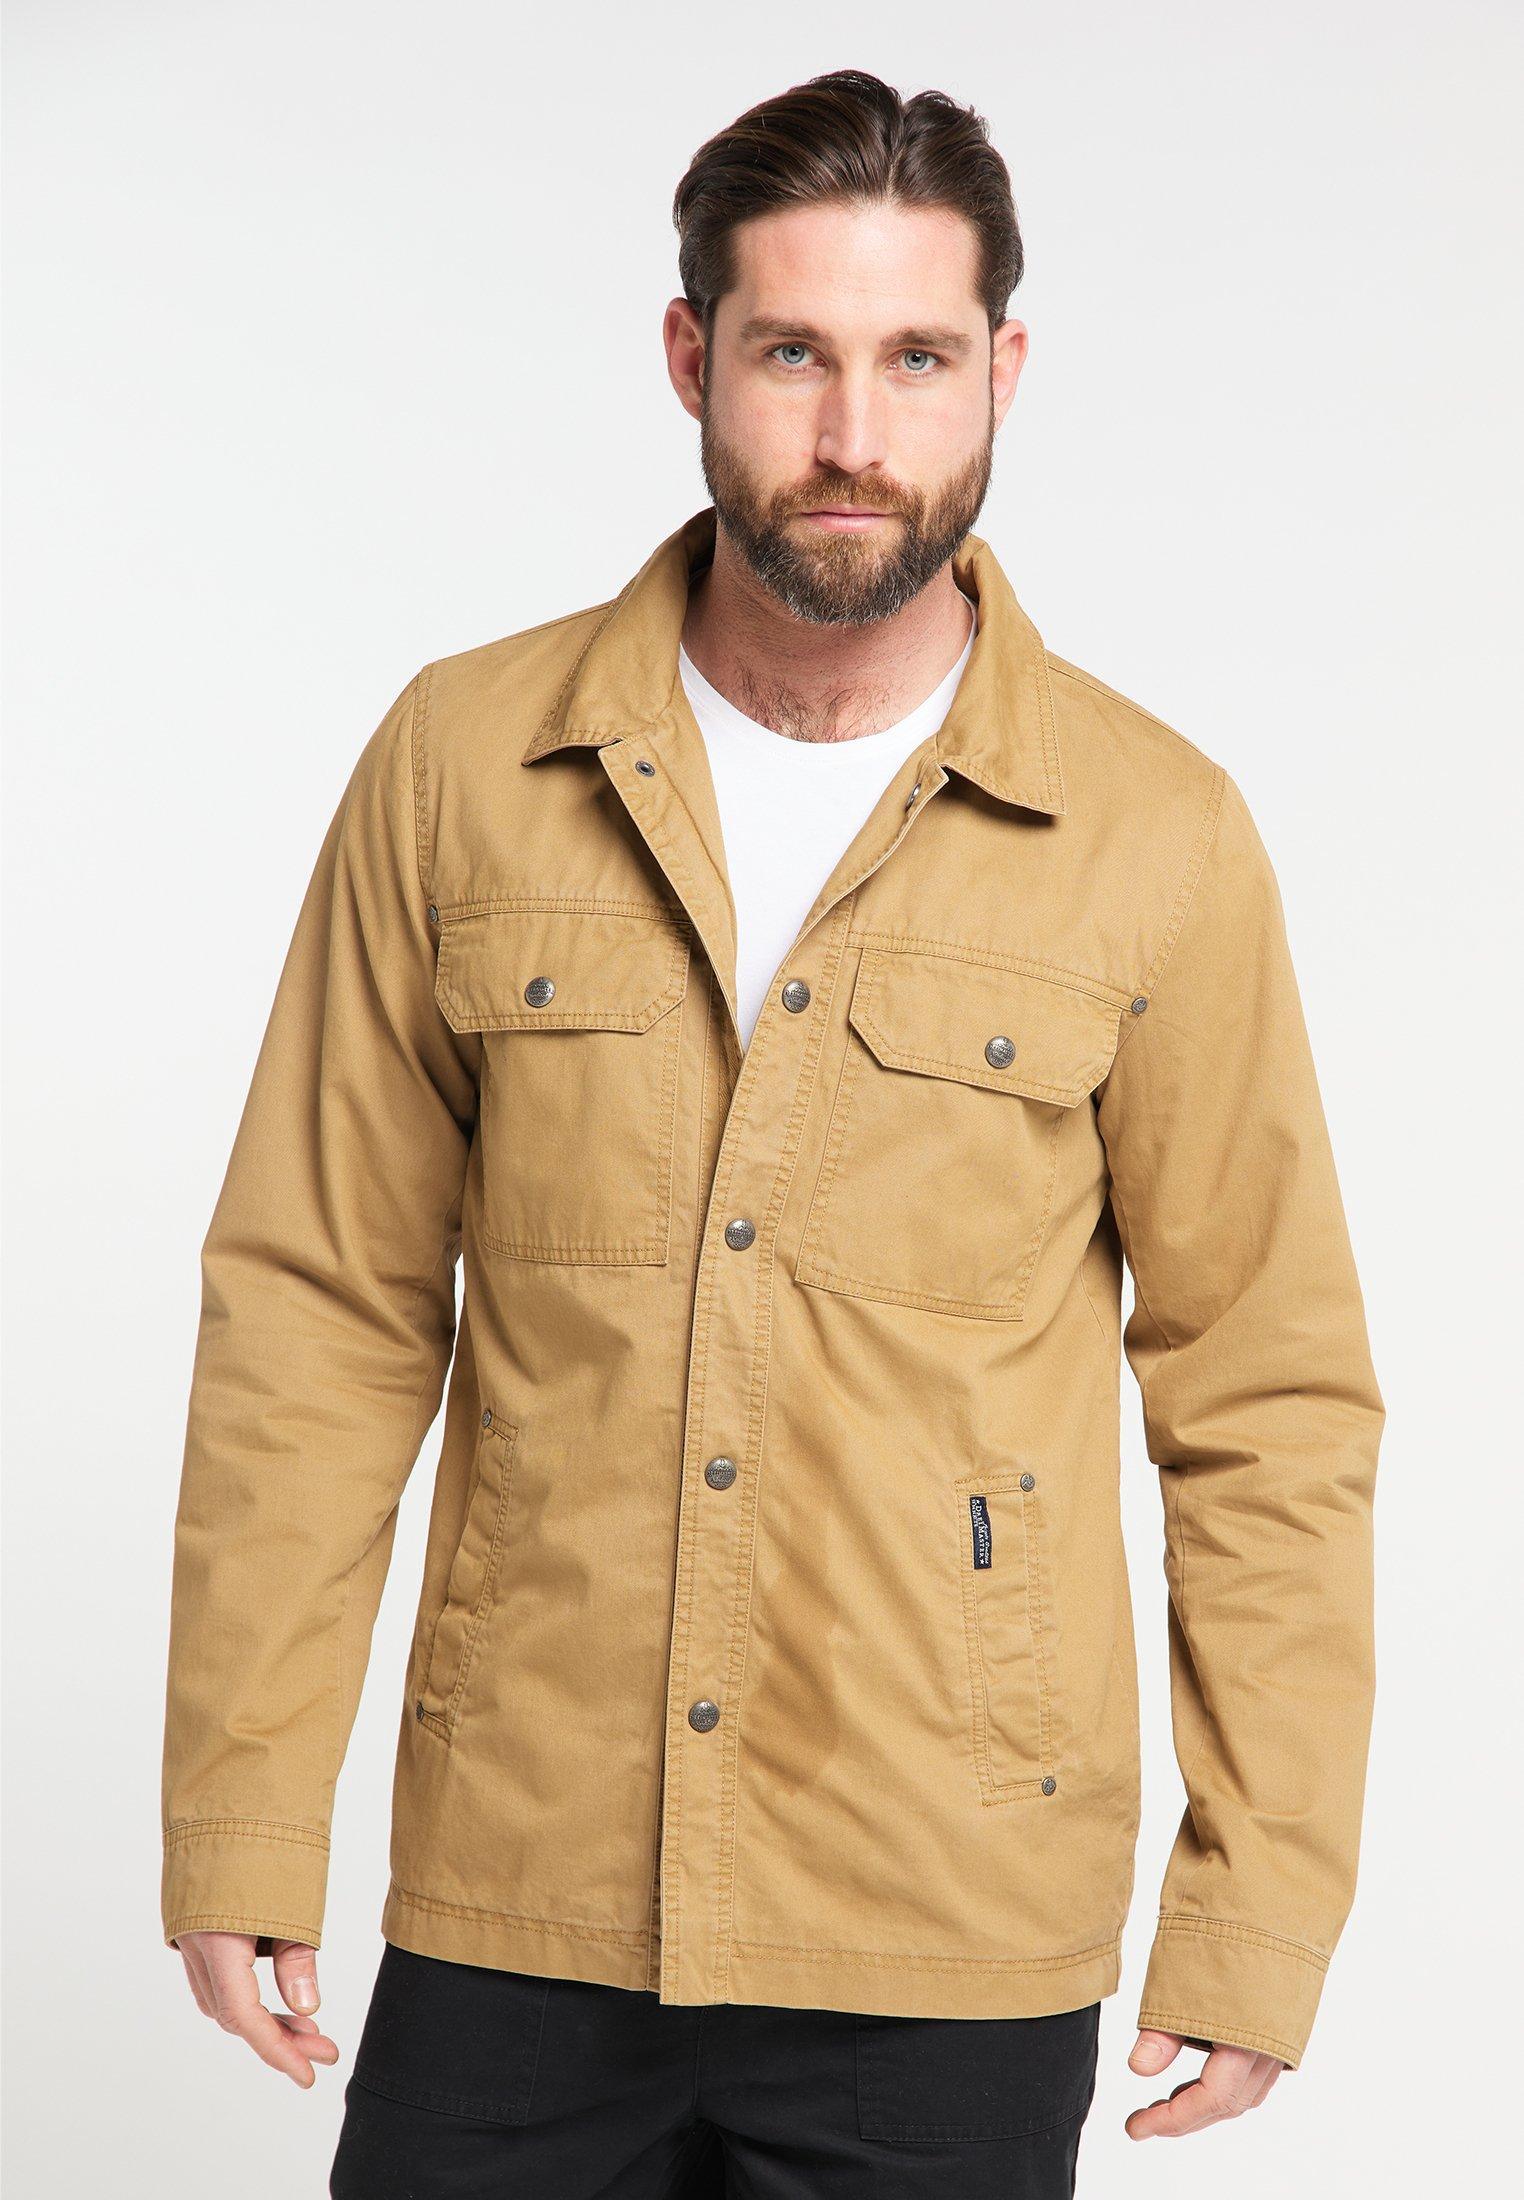 Get New Wholesale DreiMaster Light jacket - dark sand | men's clothing 2020 xQE8L